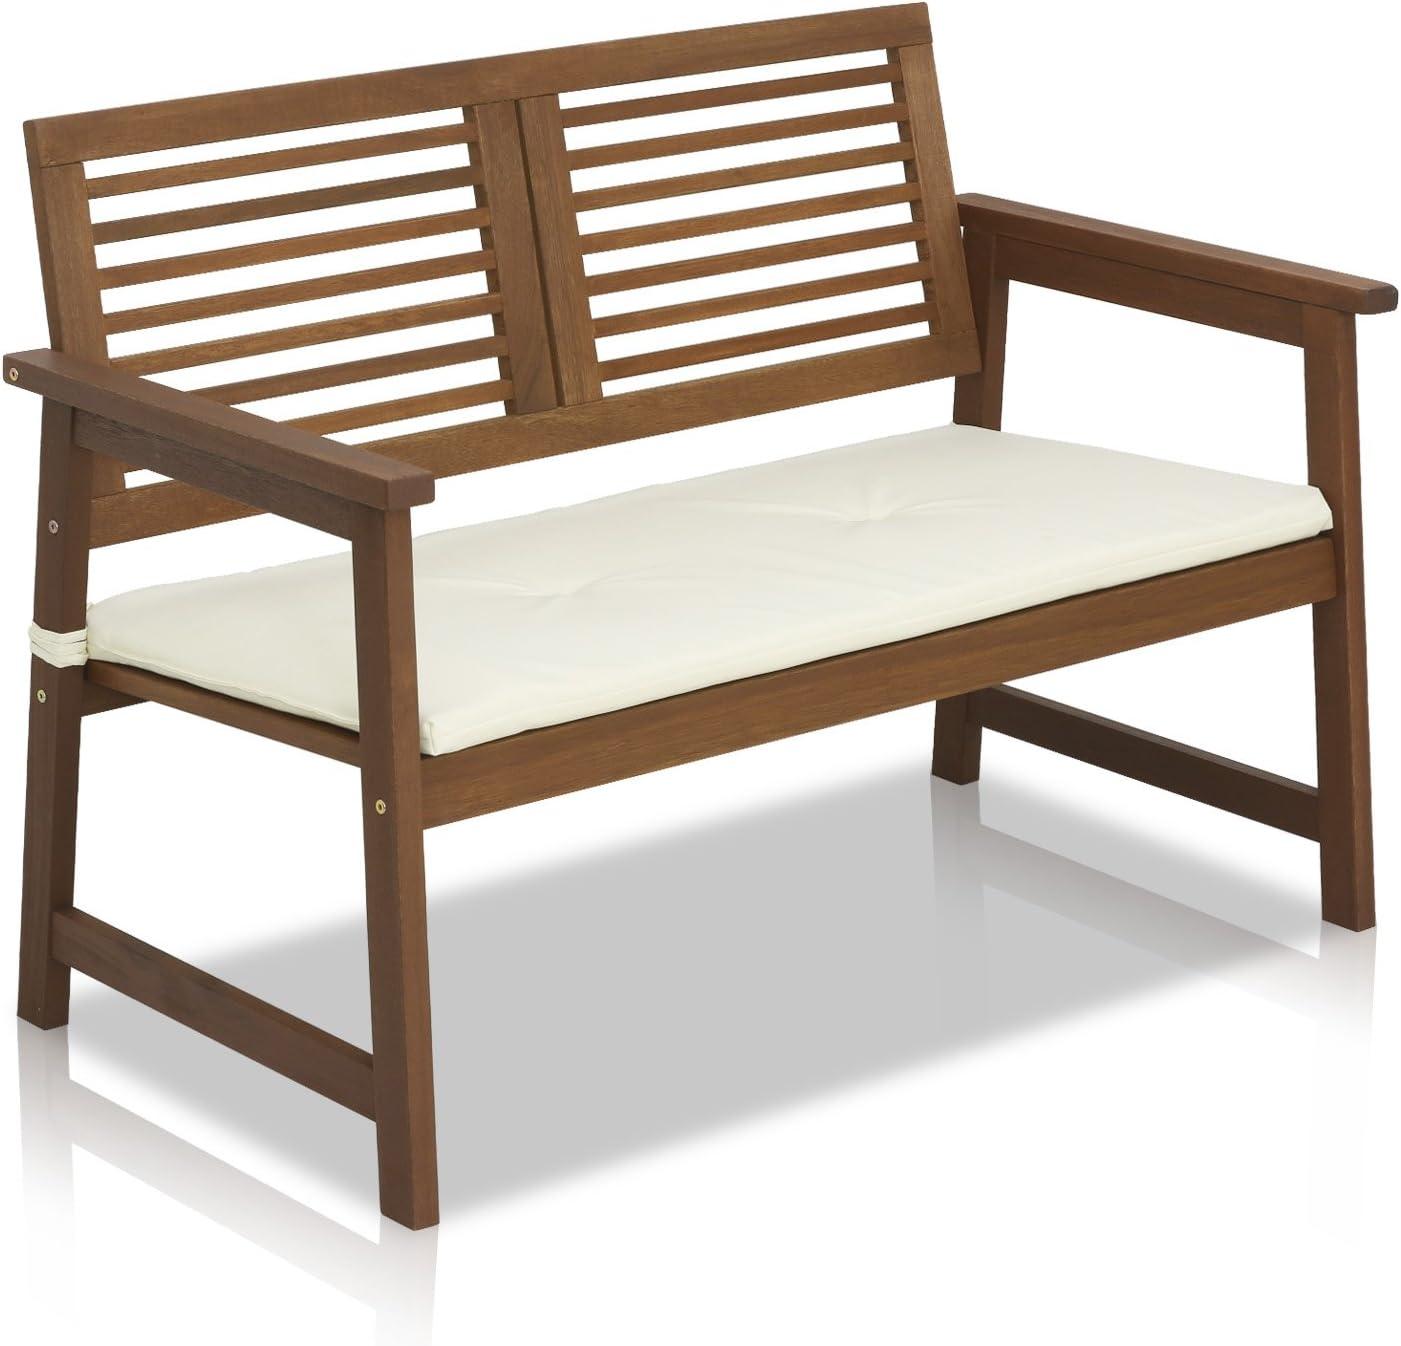 Amazon Com Furinno Fg161167 Tioman Hardwood Outdoor Bench In Teak Oil Natural Garden Outdoor